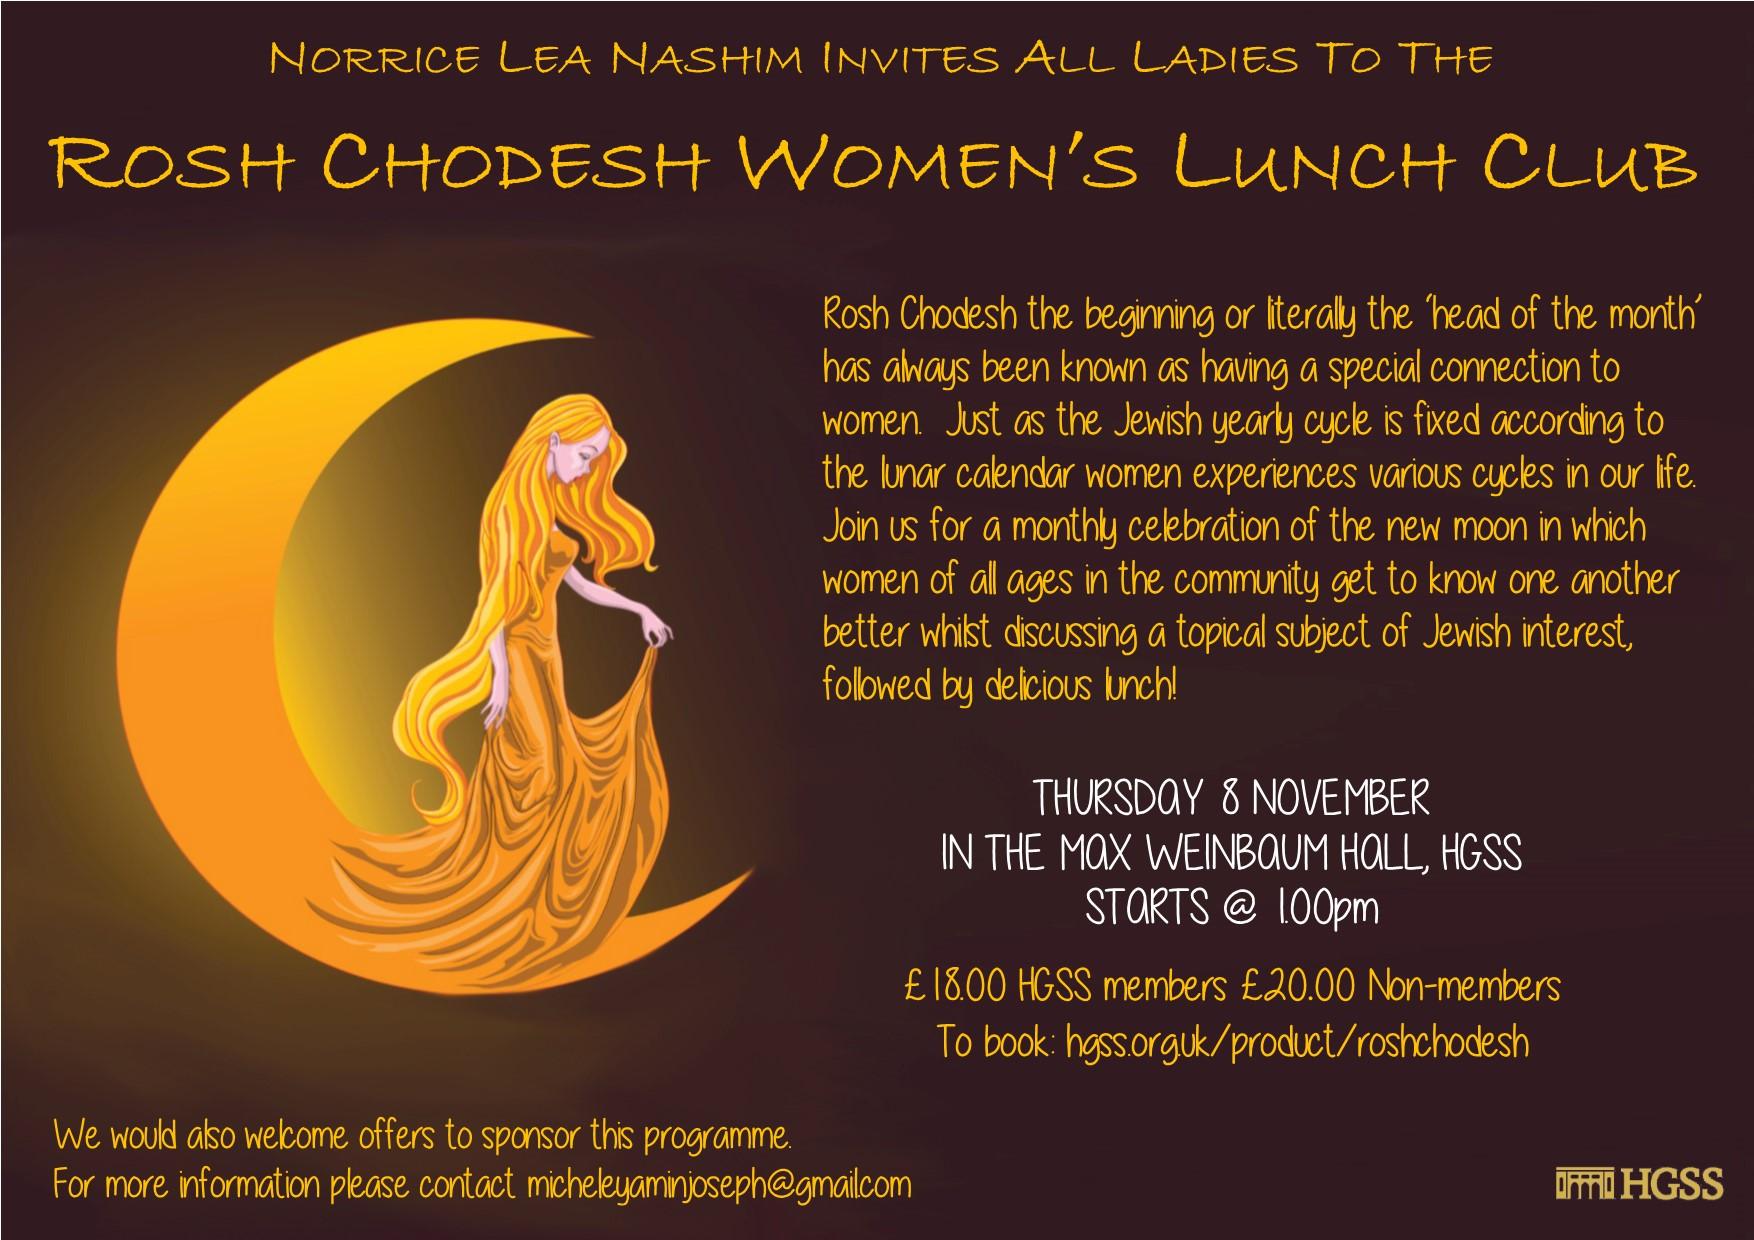 Rosh Chodesh Women's Lunch Club @ Max Weinbaum Hall